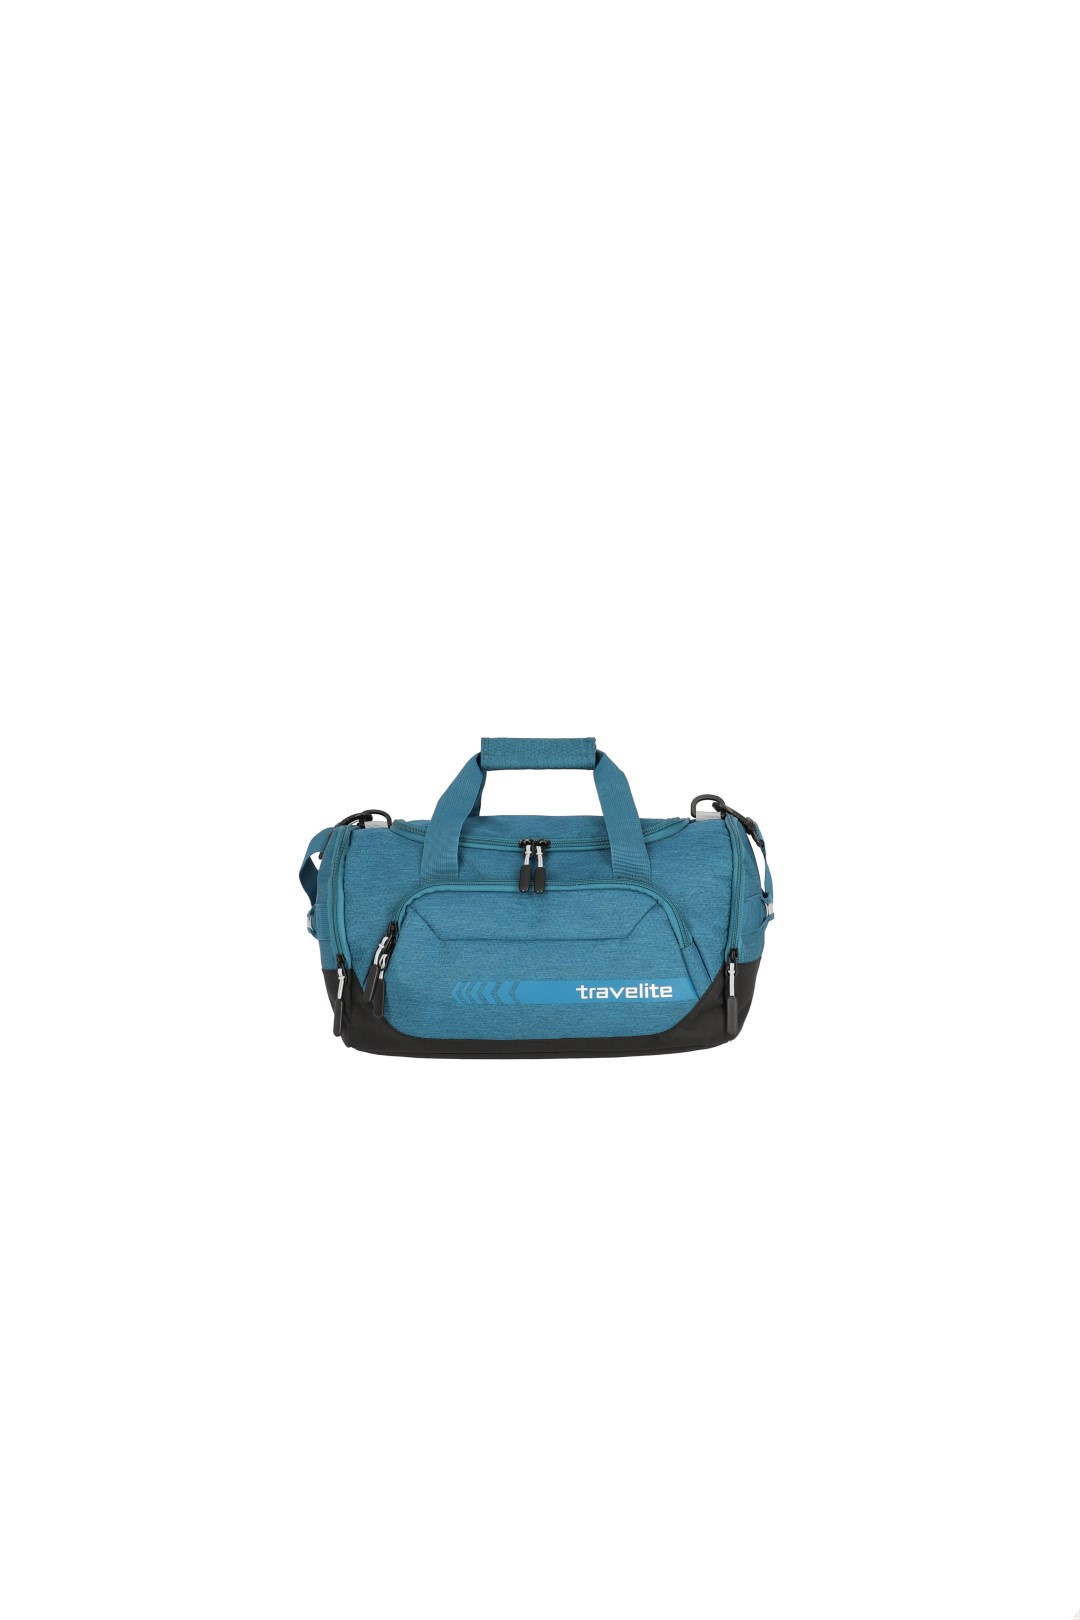 Travelite KICK OFF Duffle S 006913 Petrol